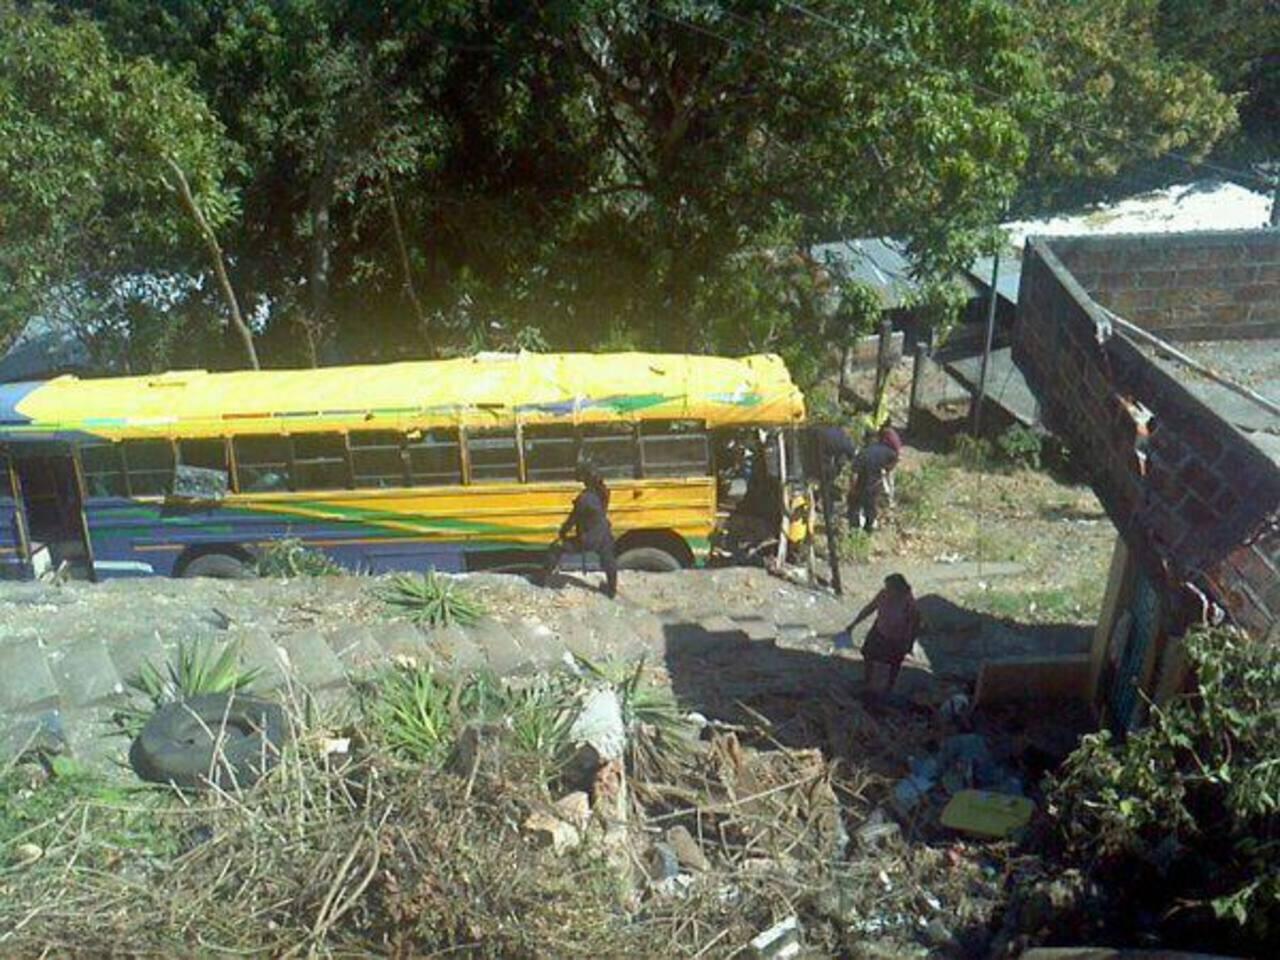 Un autobús se accidentó en Cojutepeque. Foto vía Twitter Óscar Iraheta